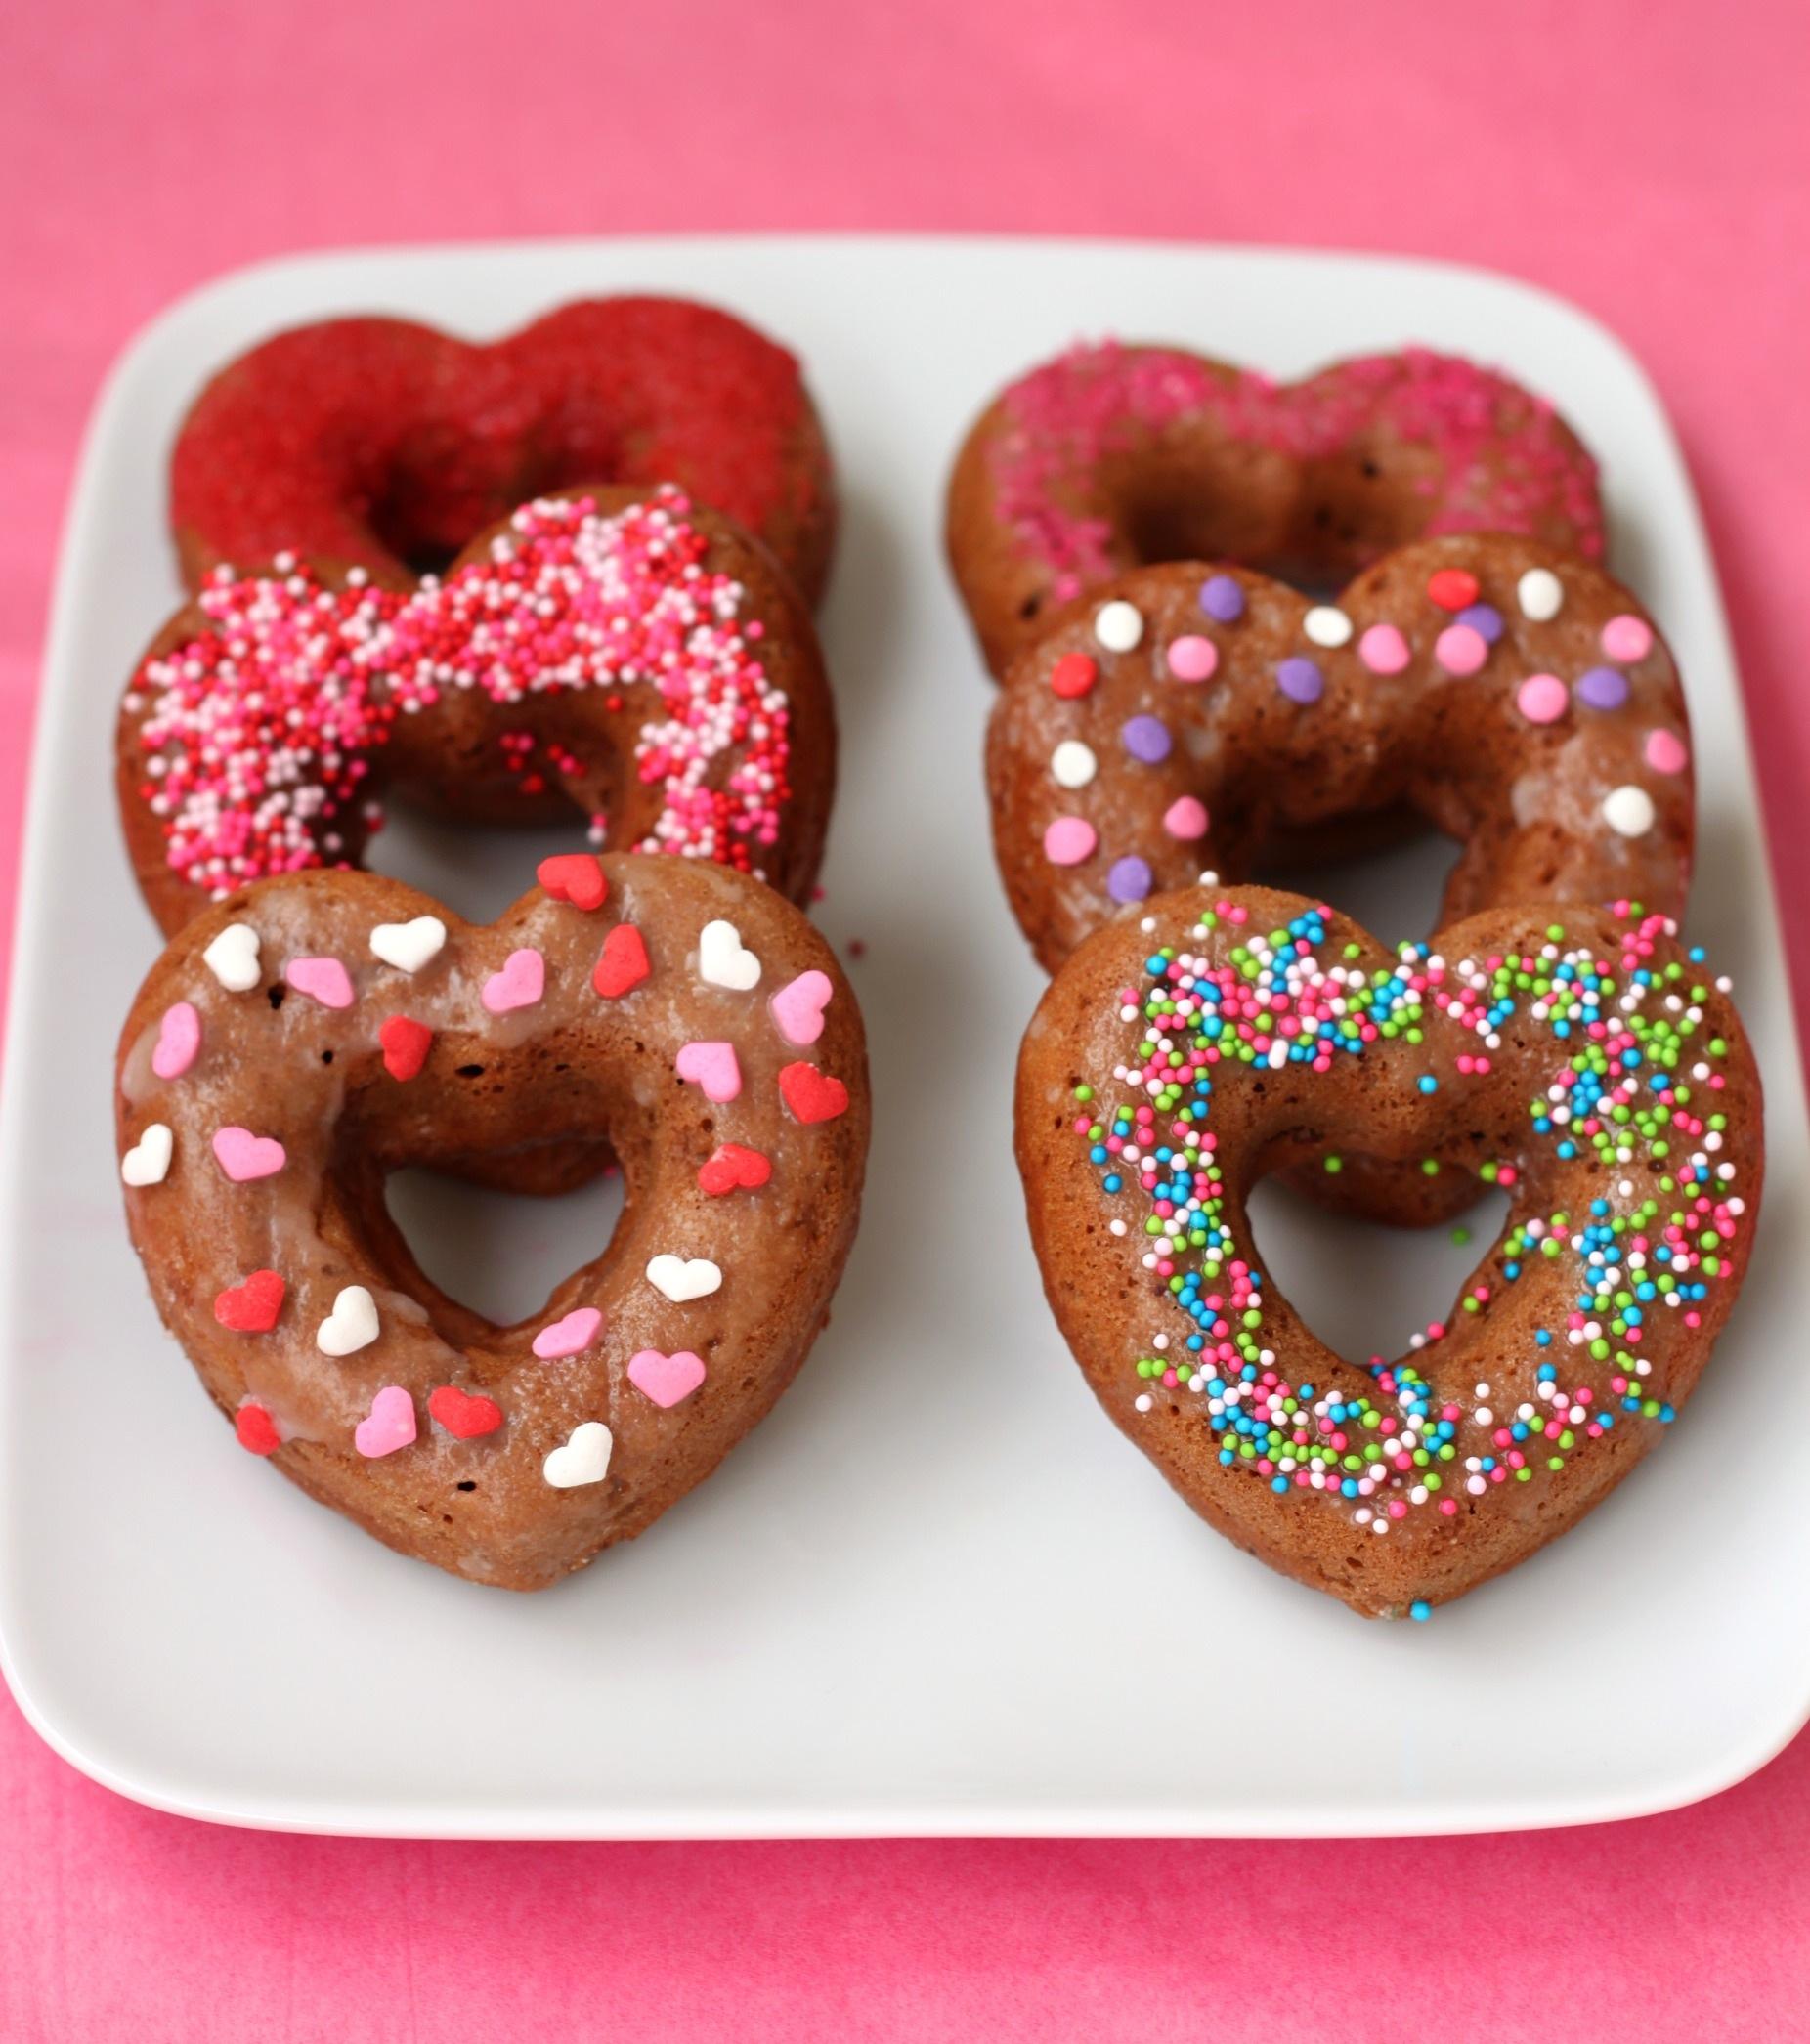 Heart healthy chocolate donut 6